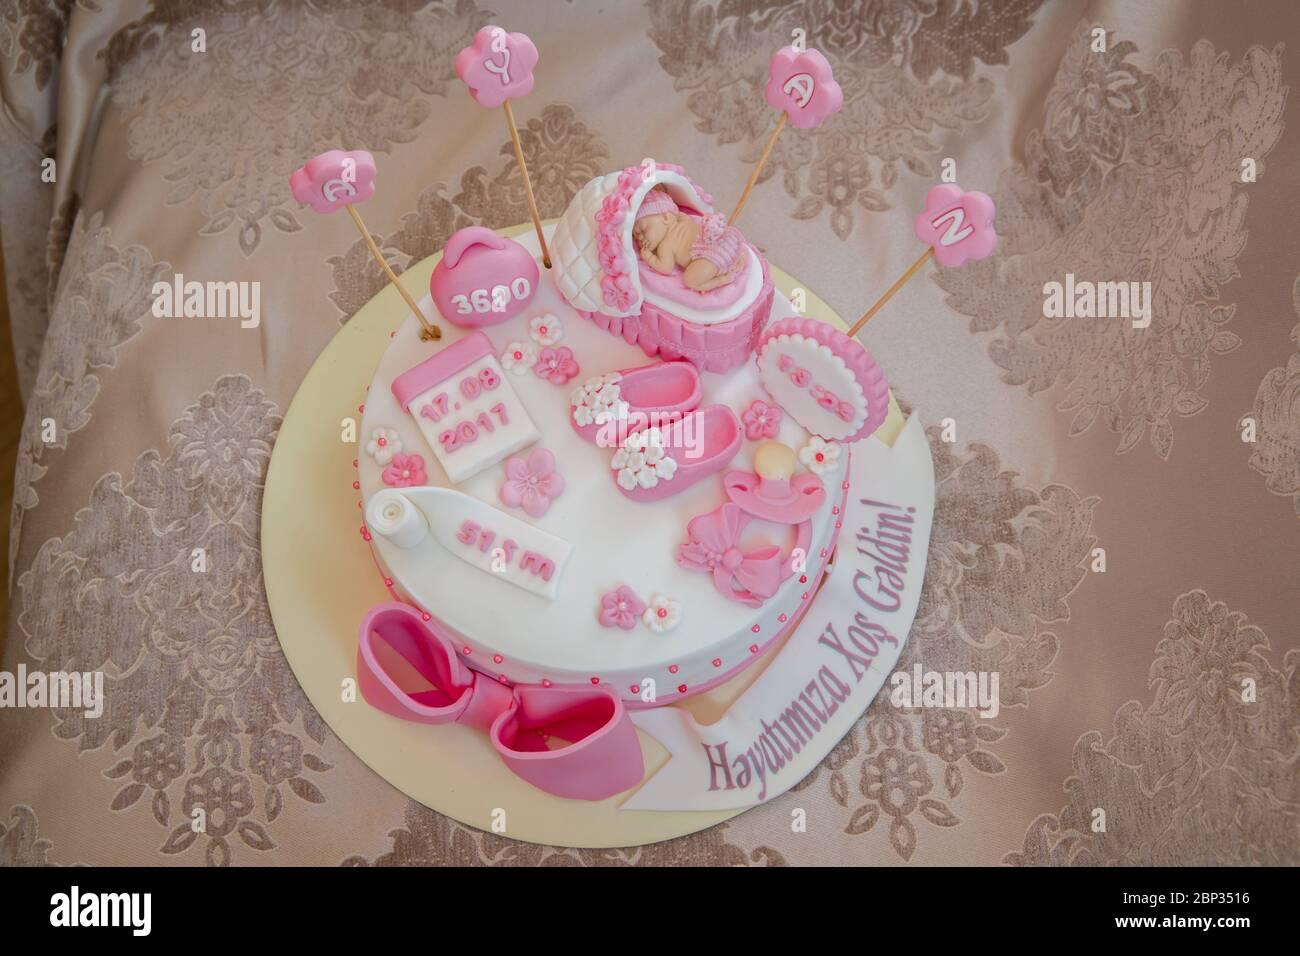 Brilliant Pink And White Theme Cake For Baby Newborn Girl Birthday Cake Birthday Cards Printable Trancafe Filternl